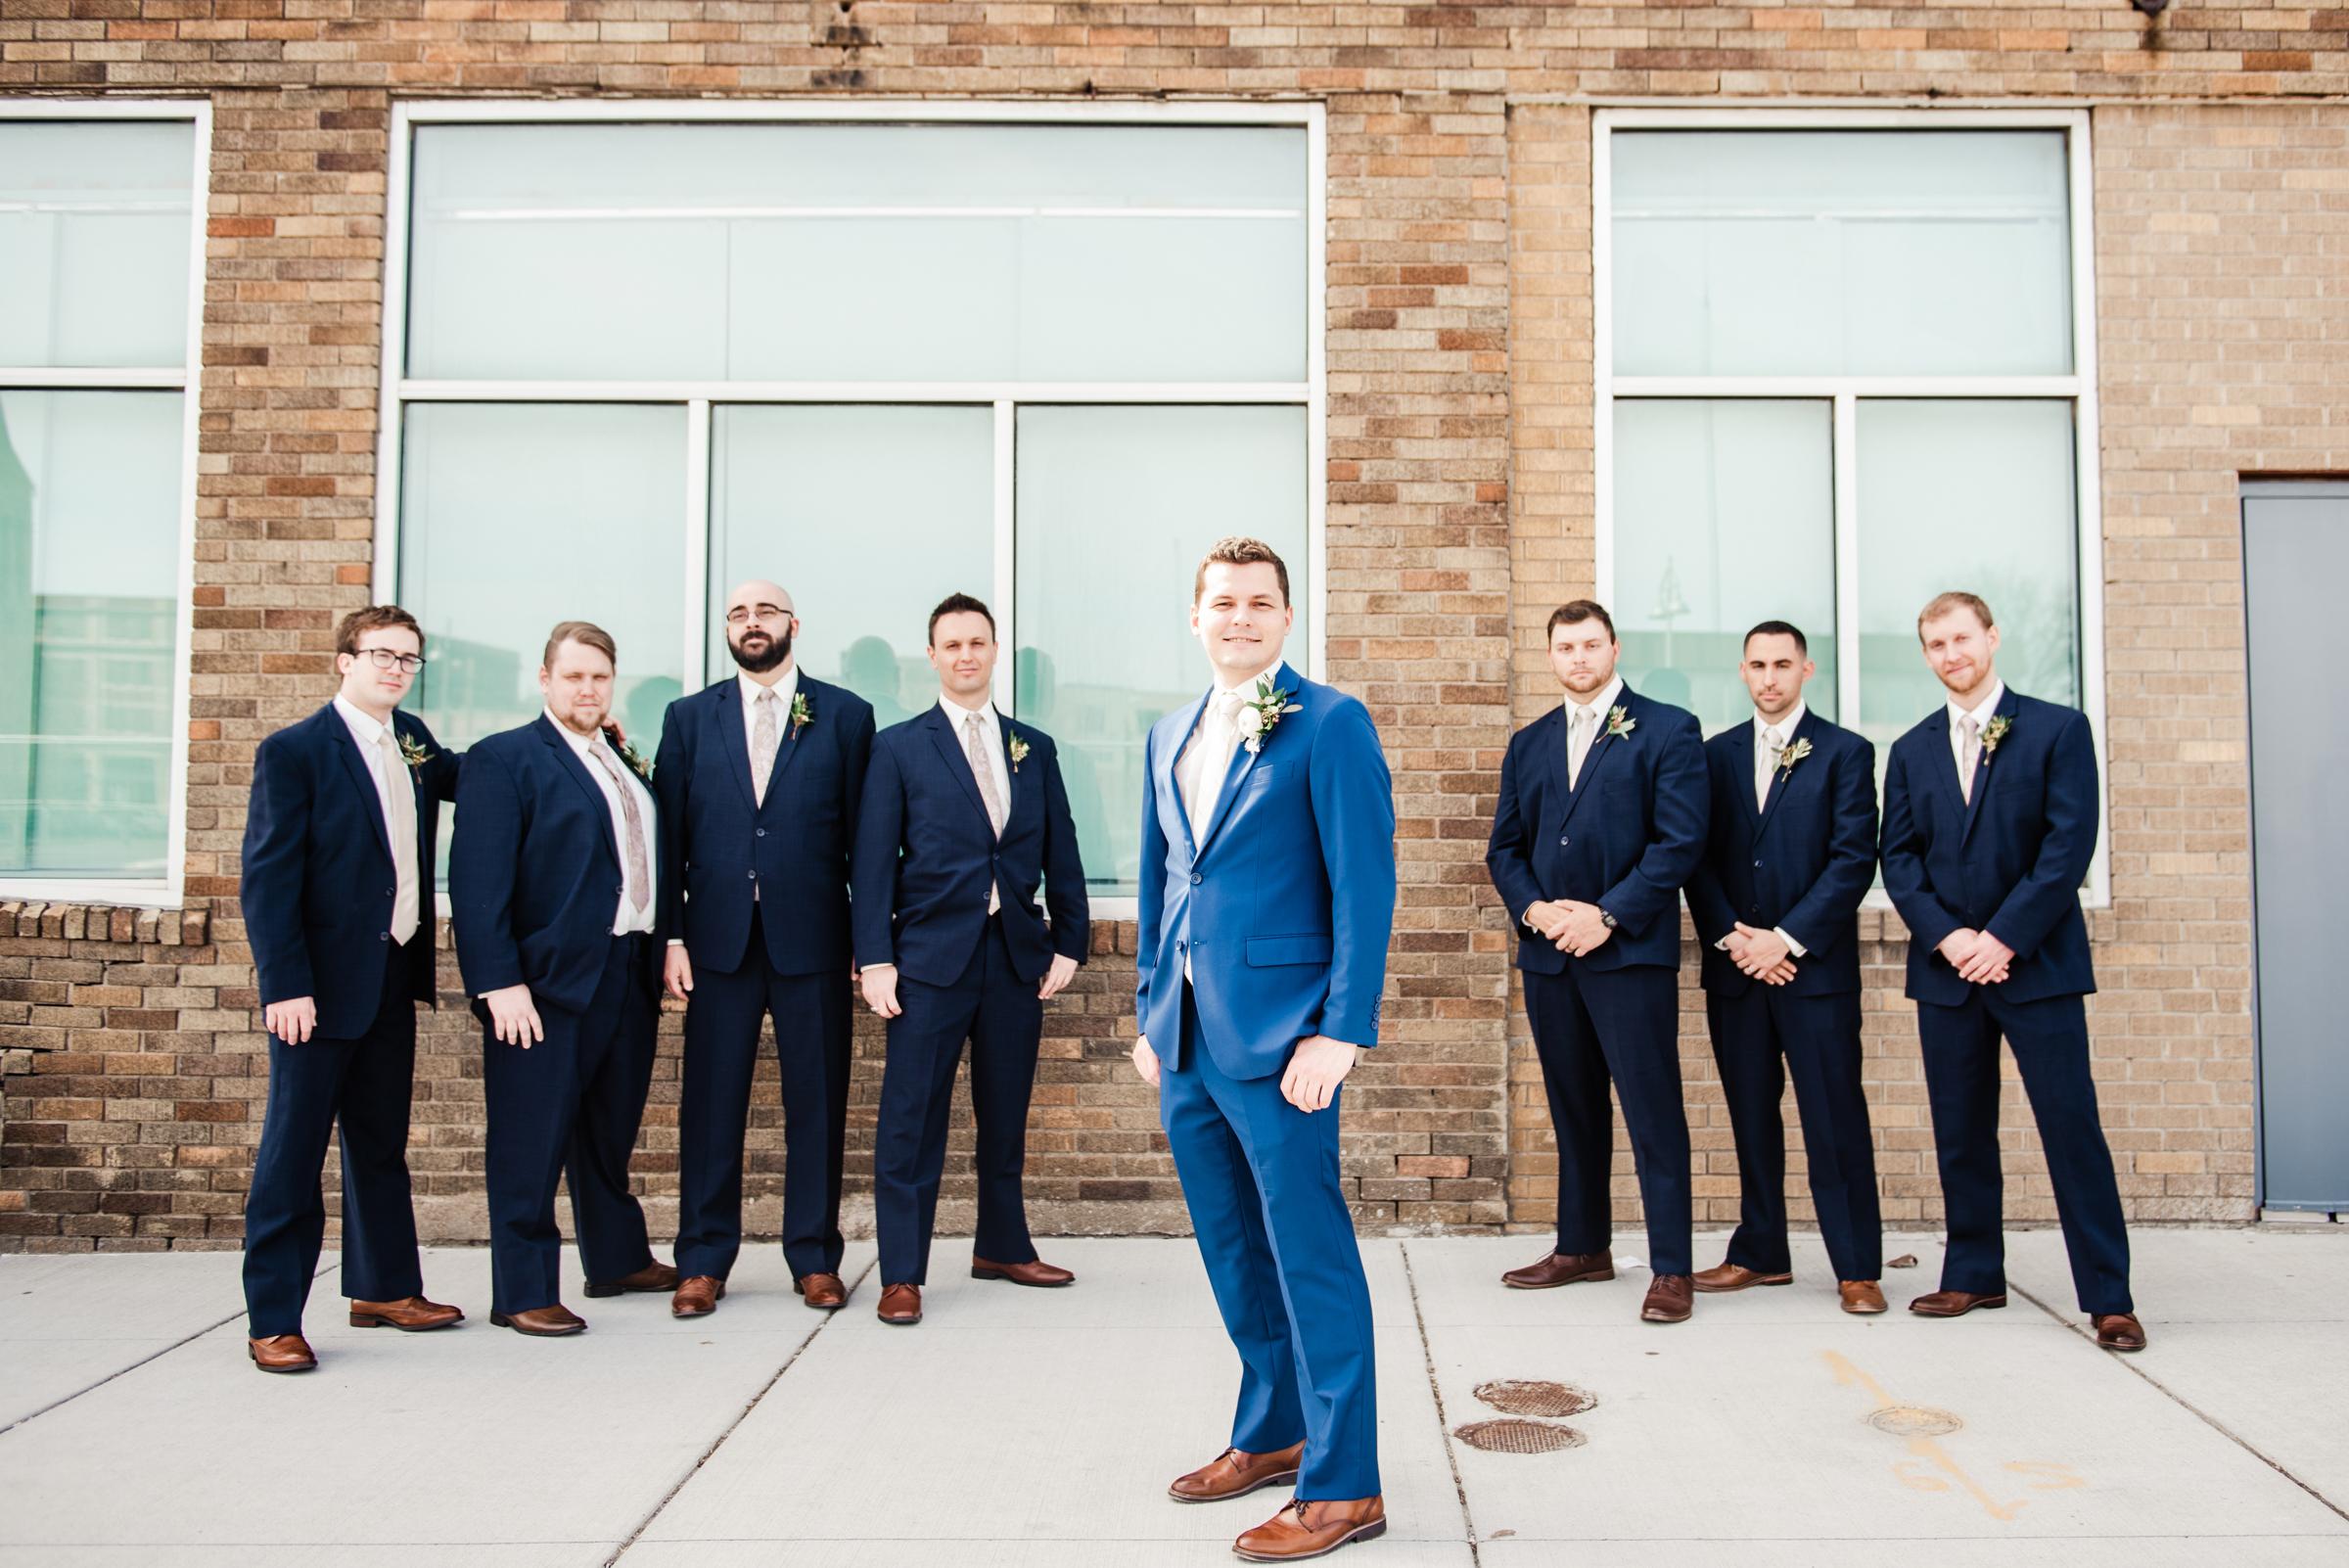 The_Arbor_LoftRochester_Wedding_JILL_STUDIO_Rochester_NY_Photographer_153800.jpg